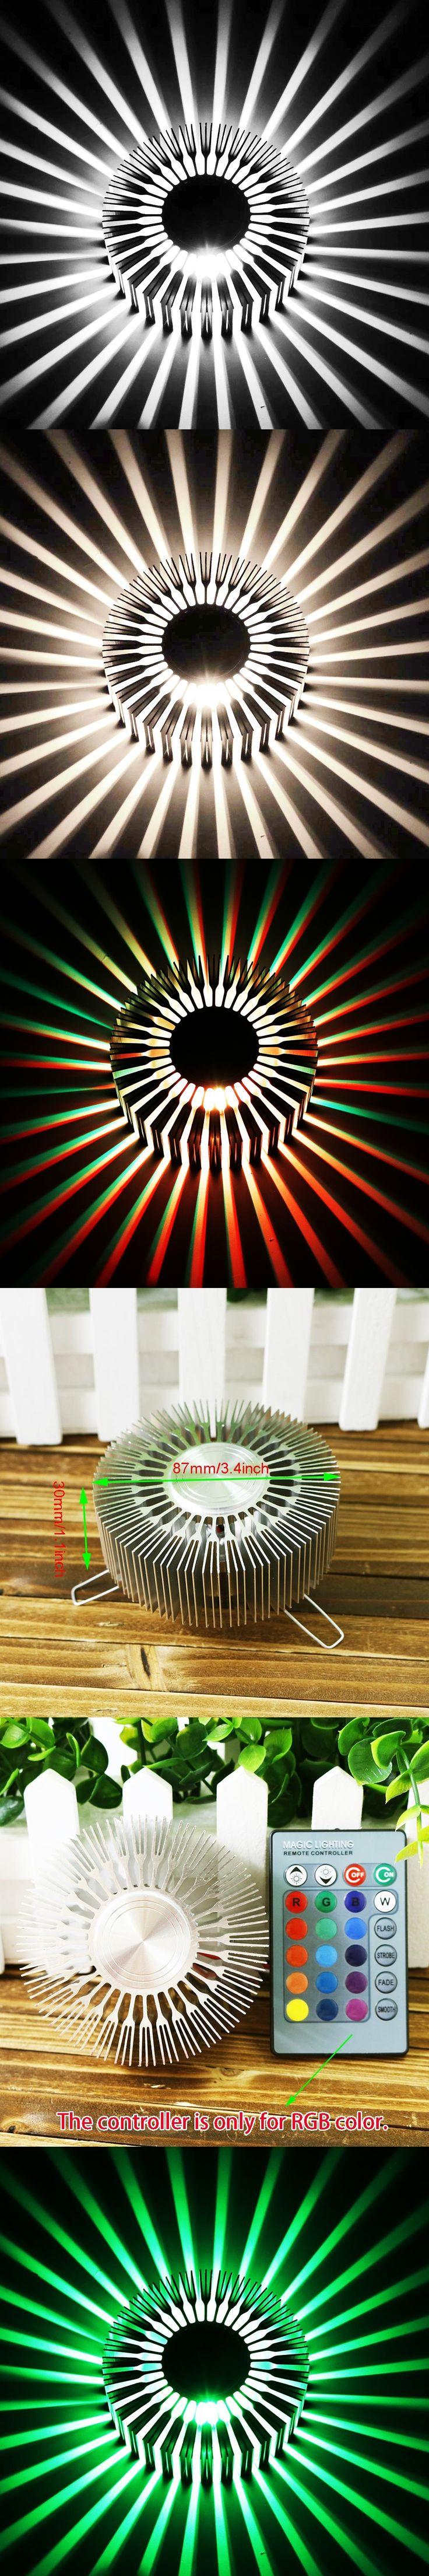 3W Sunflower Wall Lamp  AC85-265V Modern Led Lighting For Indoor Decoration corridor aisle Restaurant free shipping DA